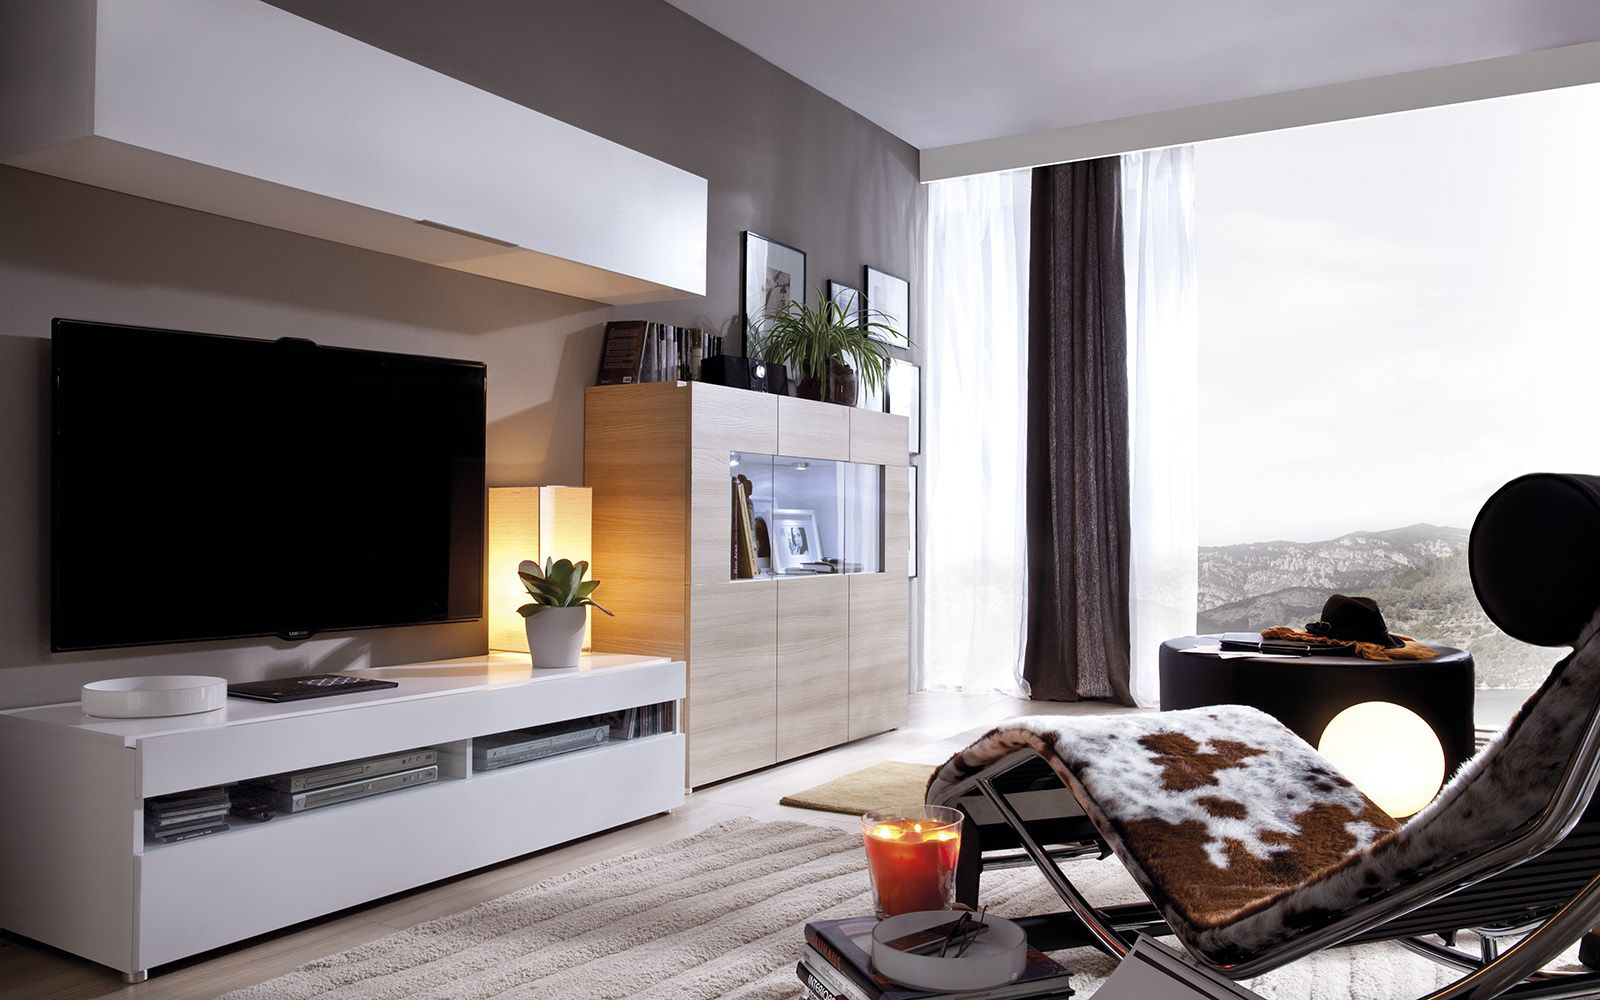 Salones Modernos Muebles Boom 045 Sal Mod 25 Decoraci N  # Muebles Boom Opiniones